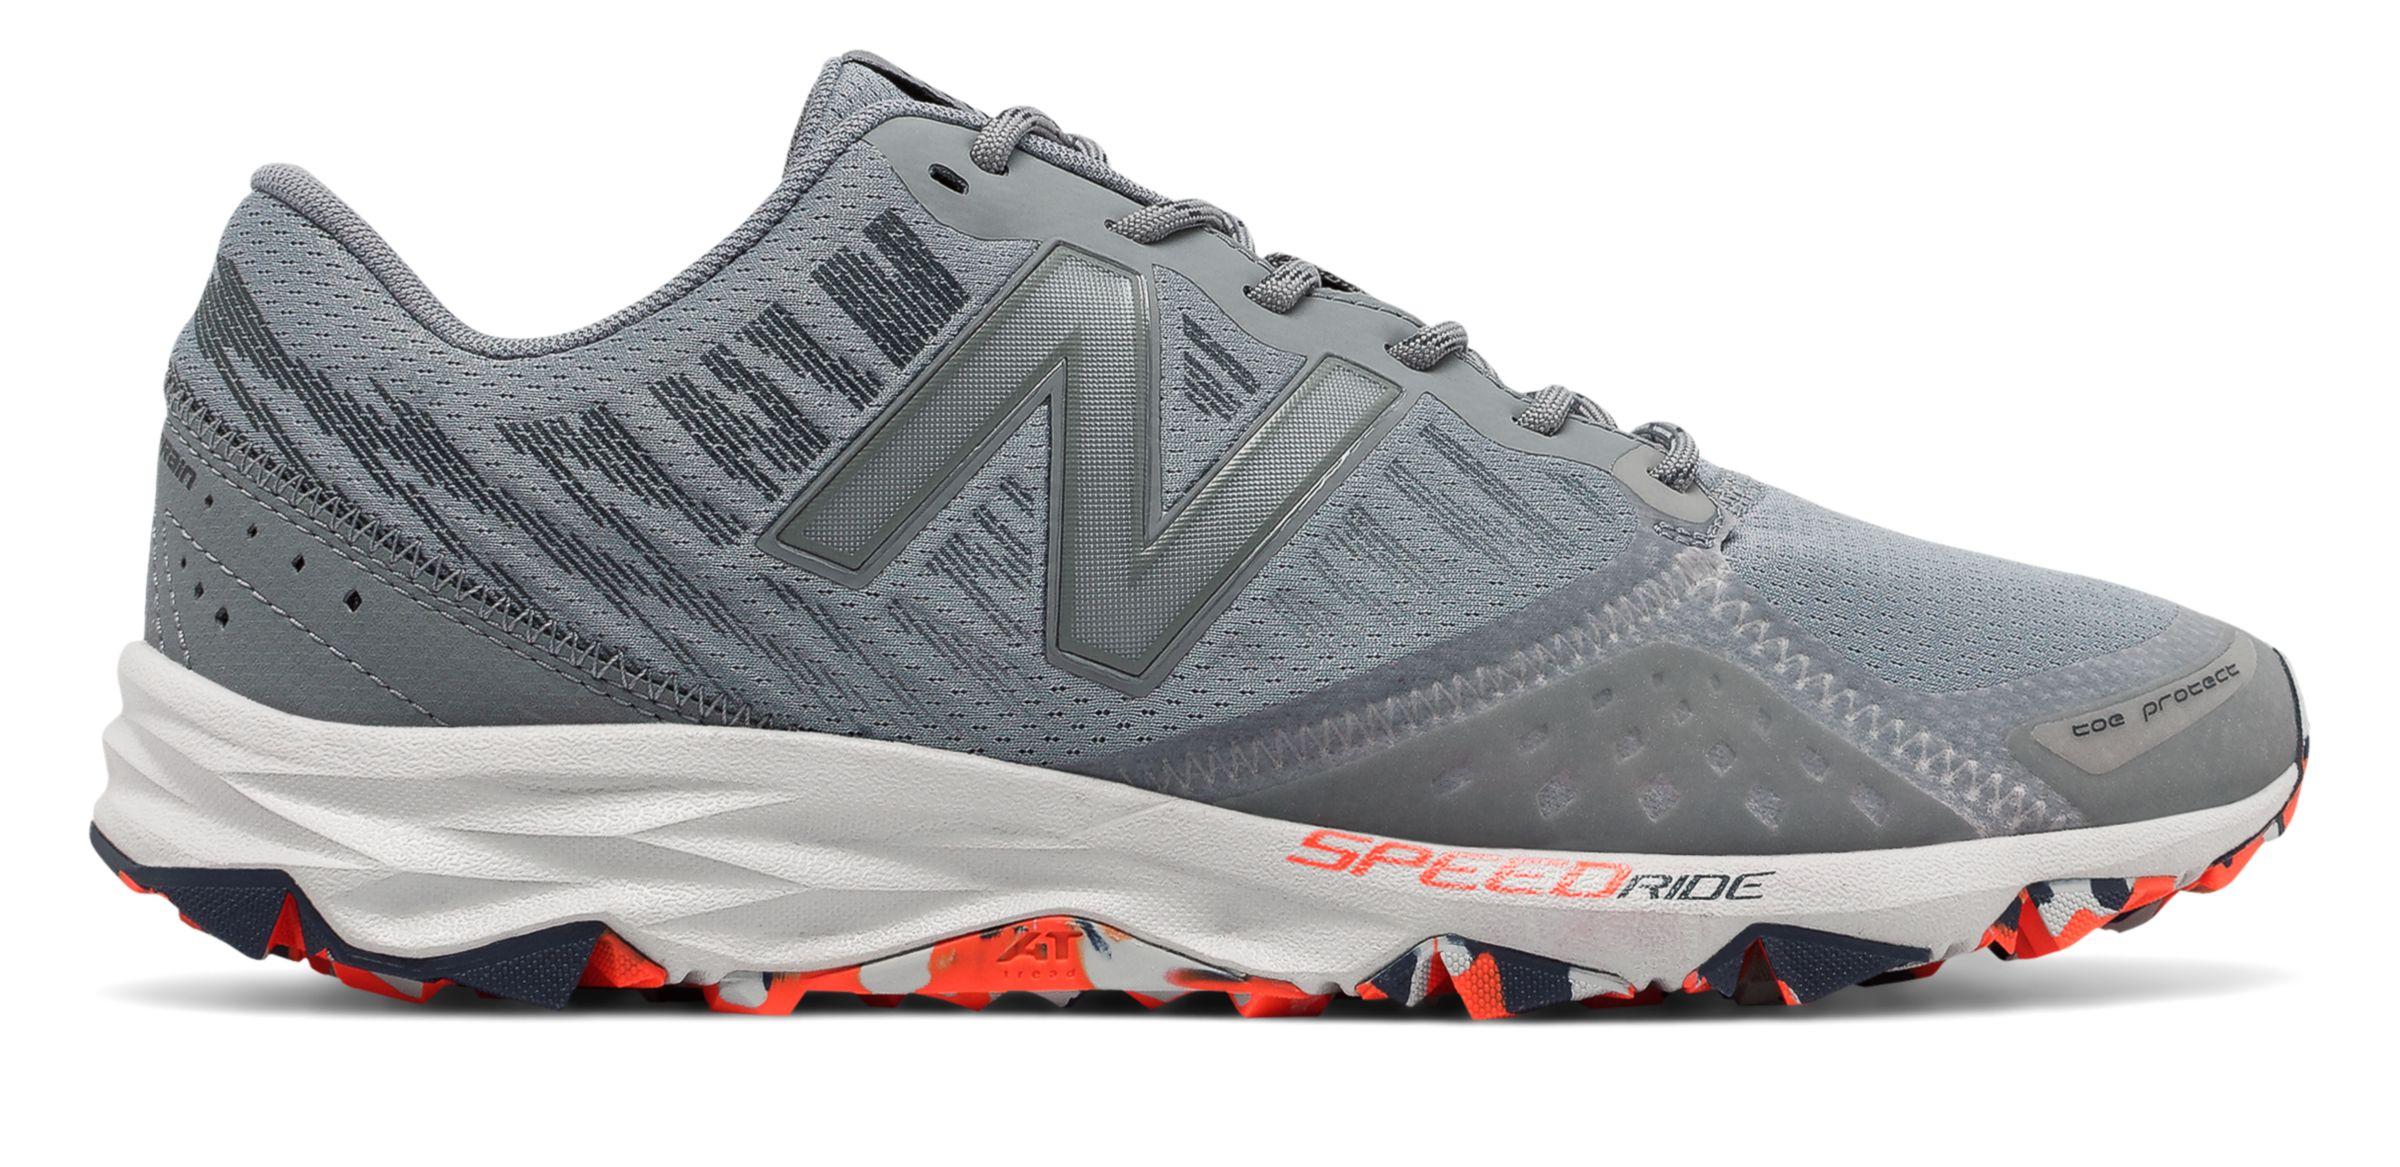 Men\u0027s New Balance Trail Running Shoes | New Balance Minimus, Fresh Foam \u0026  More | Joe\u0027s New Balance Outlet